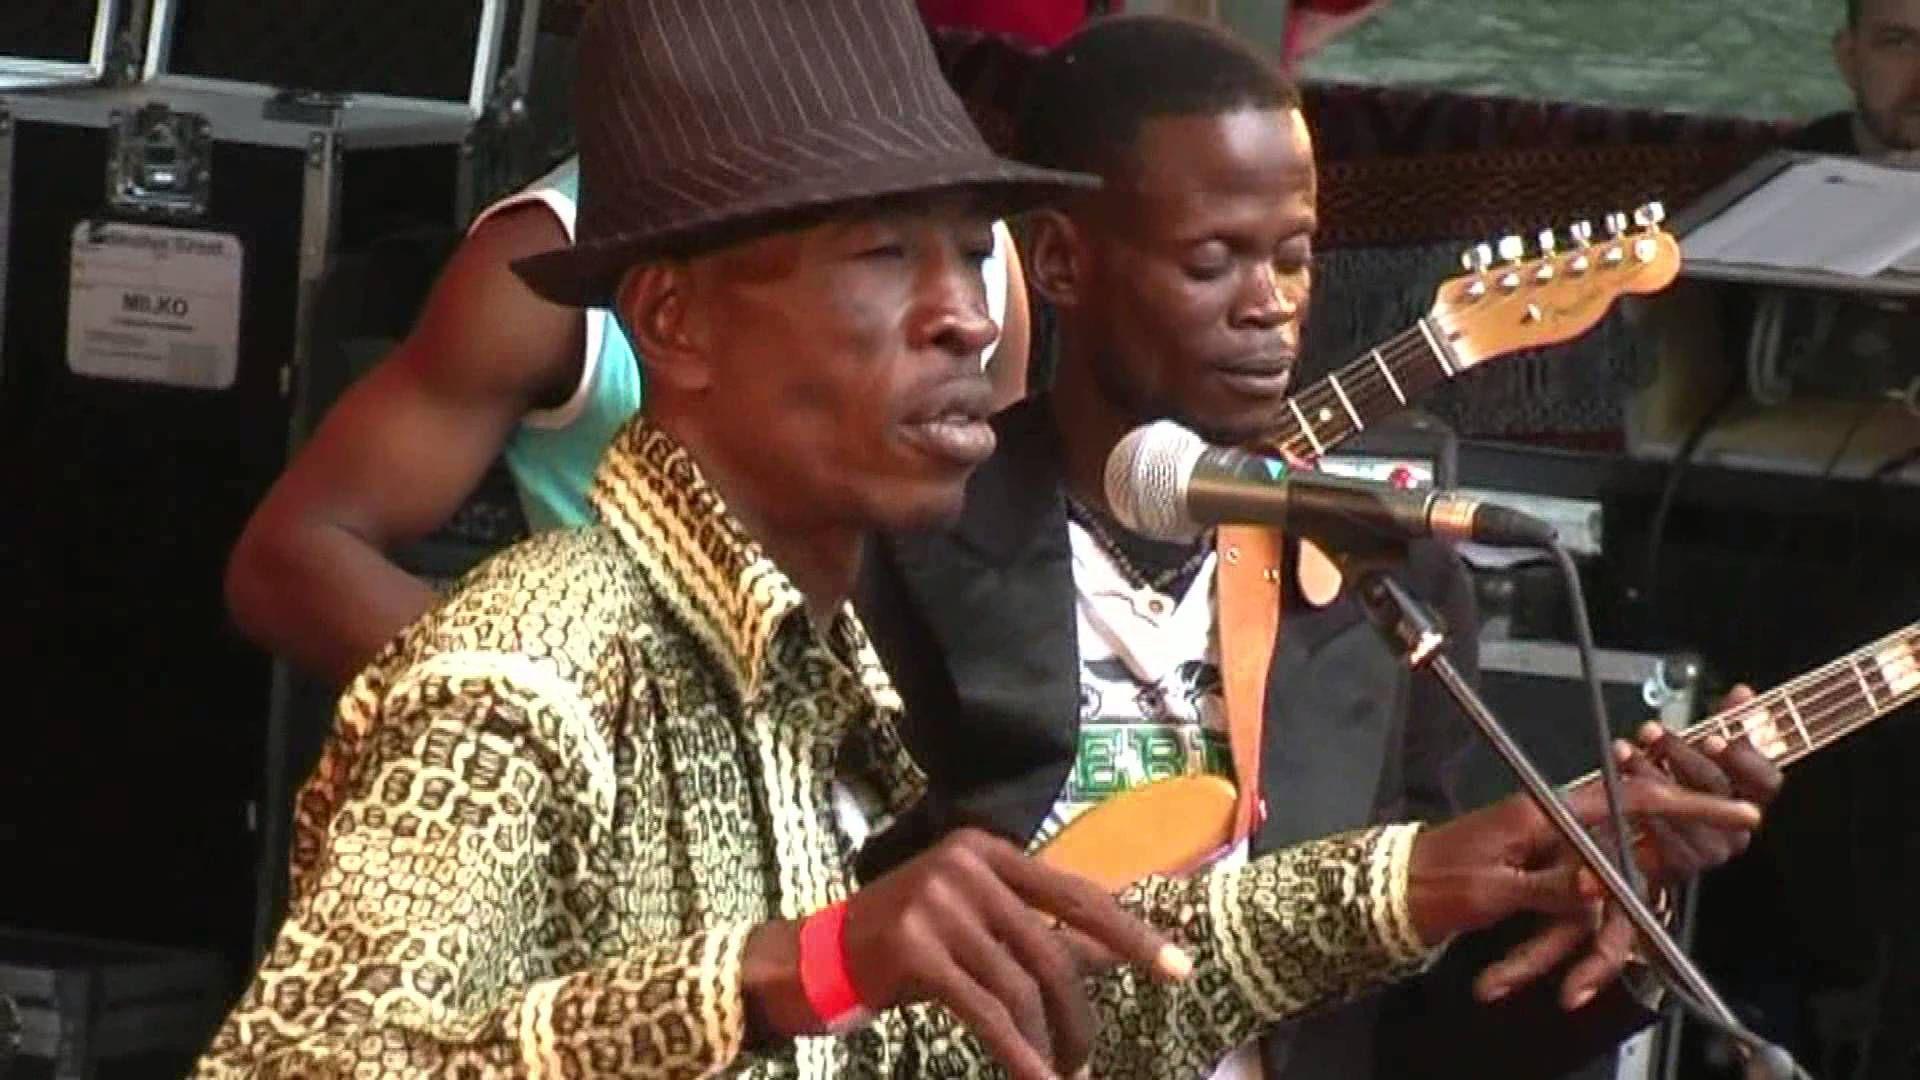 Introducing Afrikafestival Hertme AFH1 World music